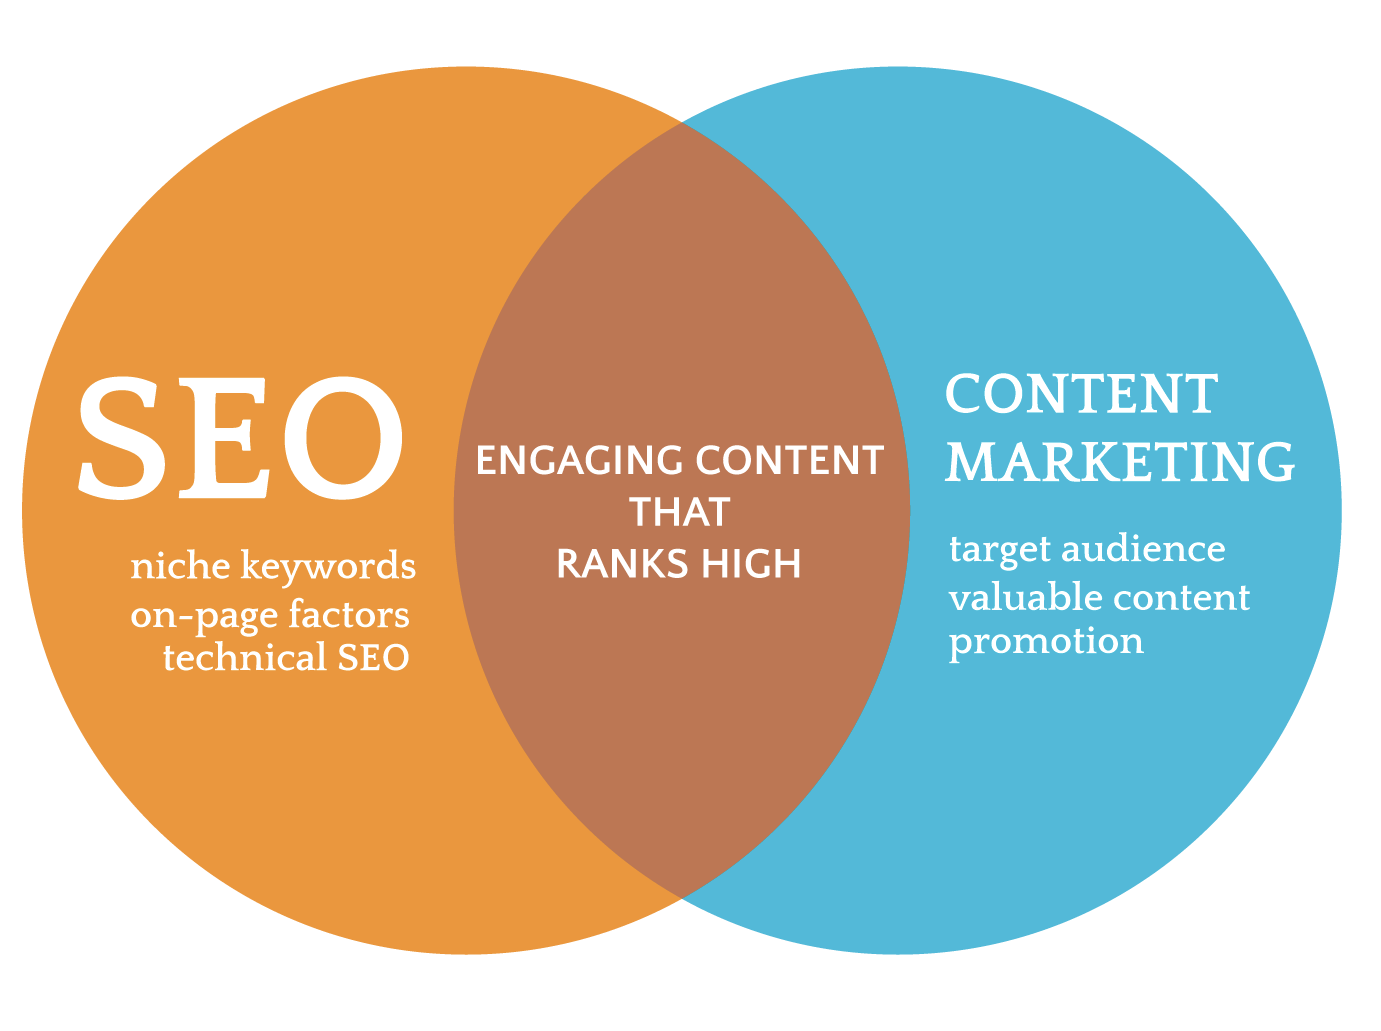 SEO and Content Marketing venn diagram